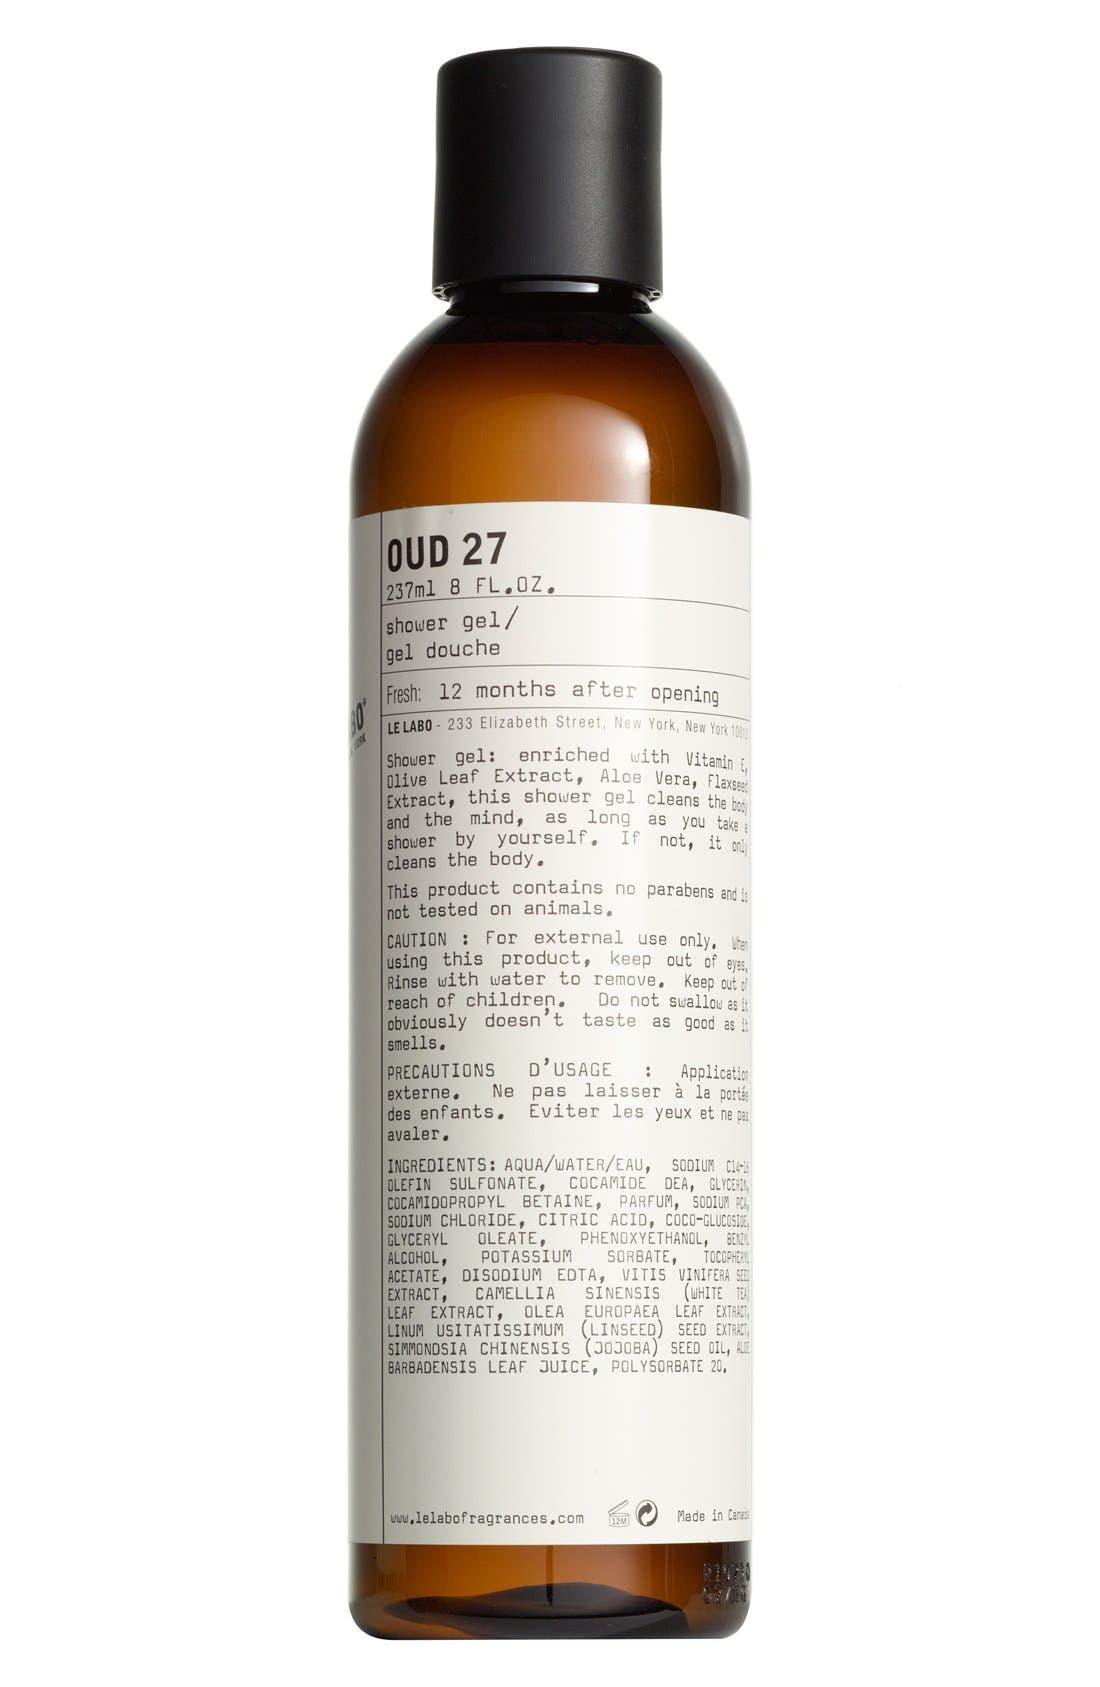 Le Labo 'Oud 27' Shower Gel